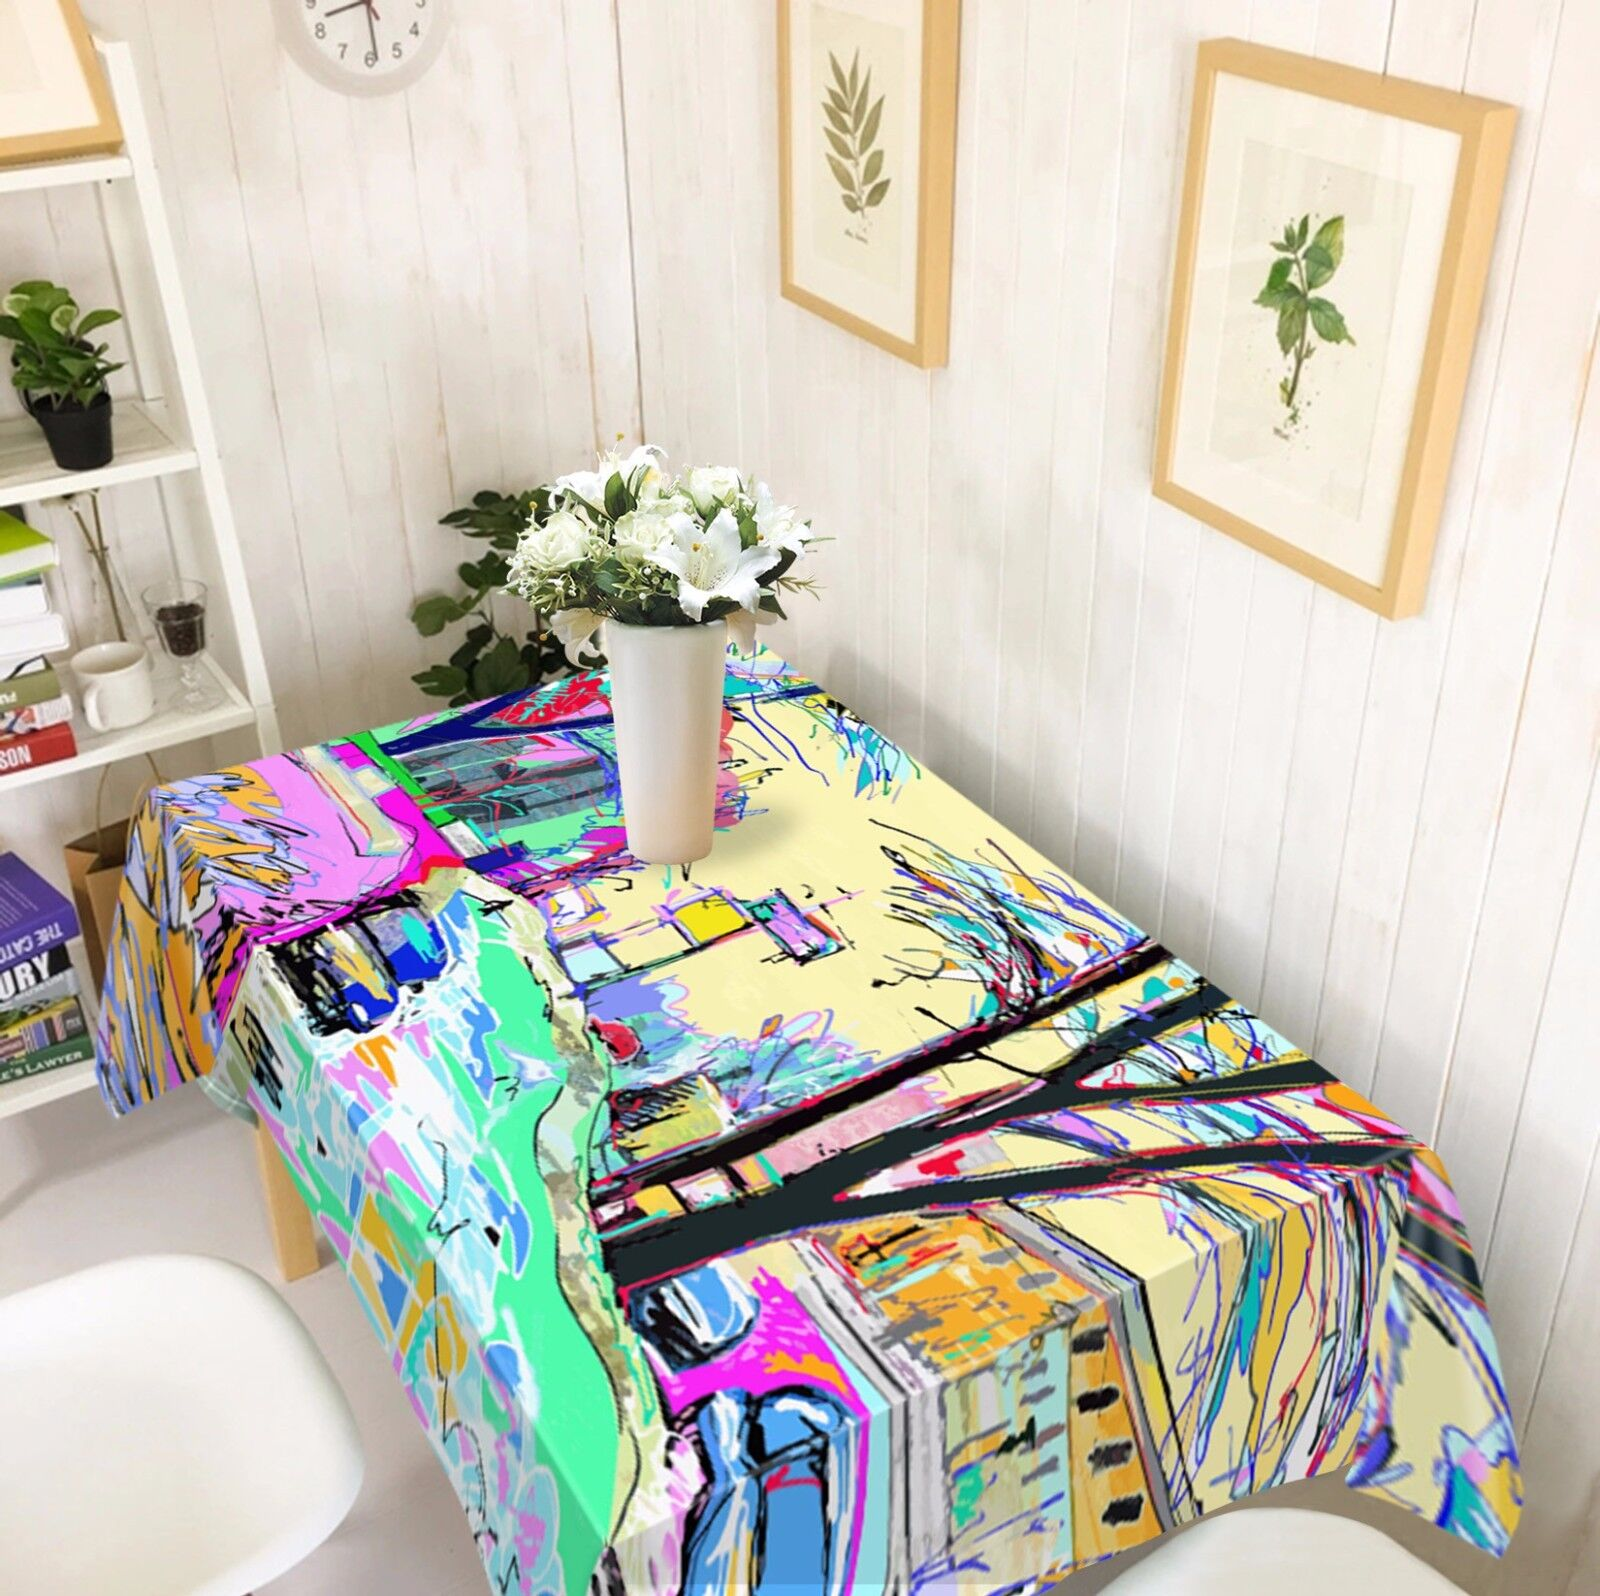 3D Paint 5 Tablecloth Table Cover Cloth Birthday Party AJ WALLPAPER UK Lemon